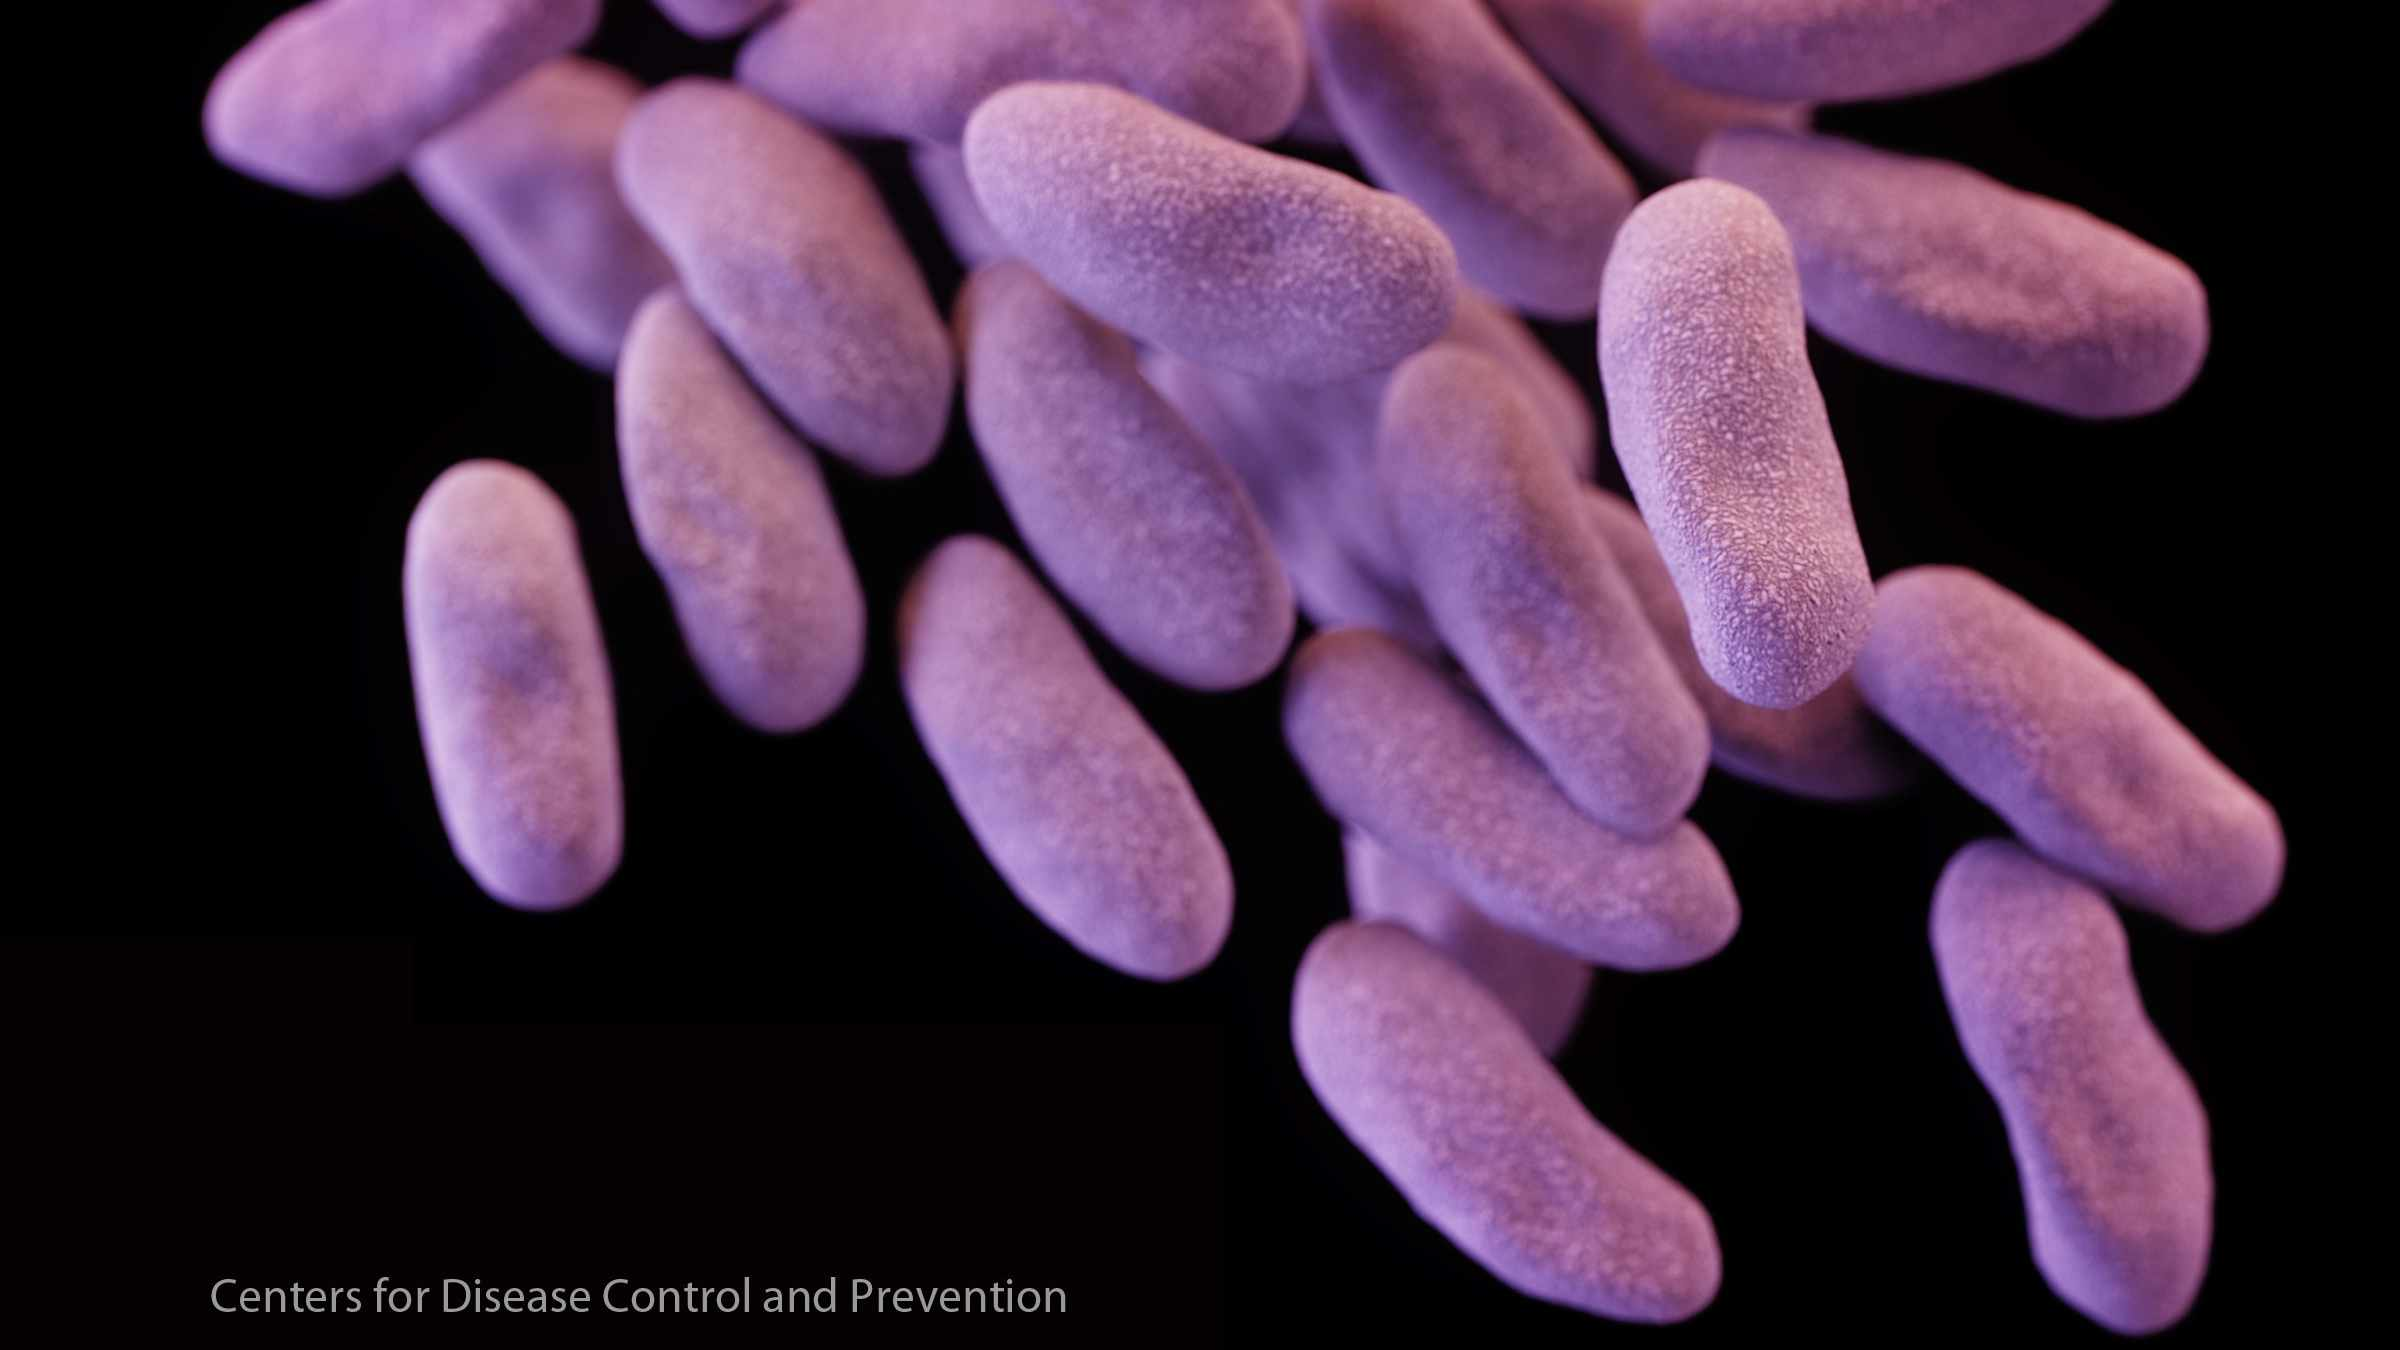 CRE carbapenem-resistant Enterobacteriaceae